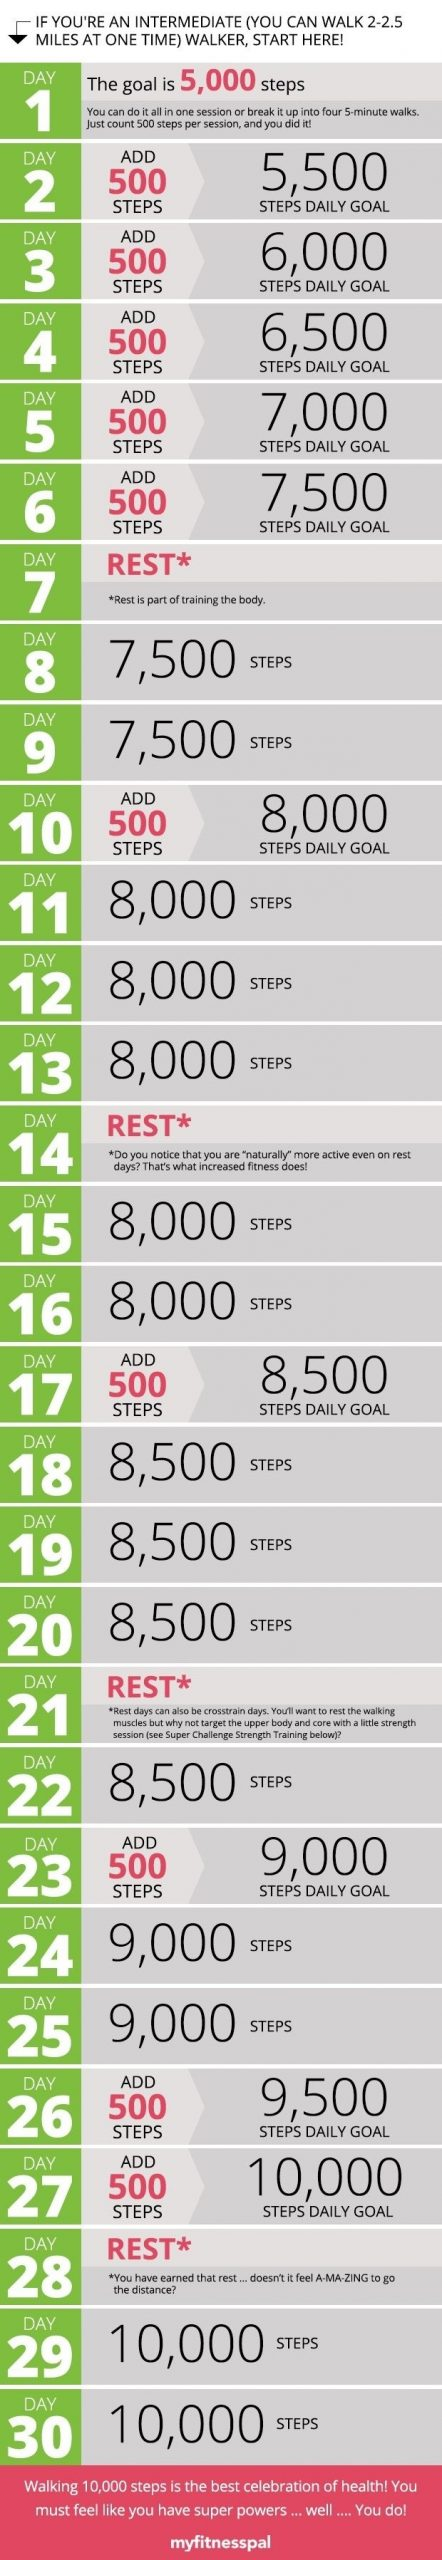 The 30-Day Walking Challenge | Myfitnesspal  Wellness Challenge Chart